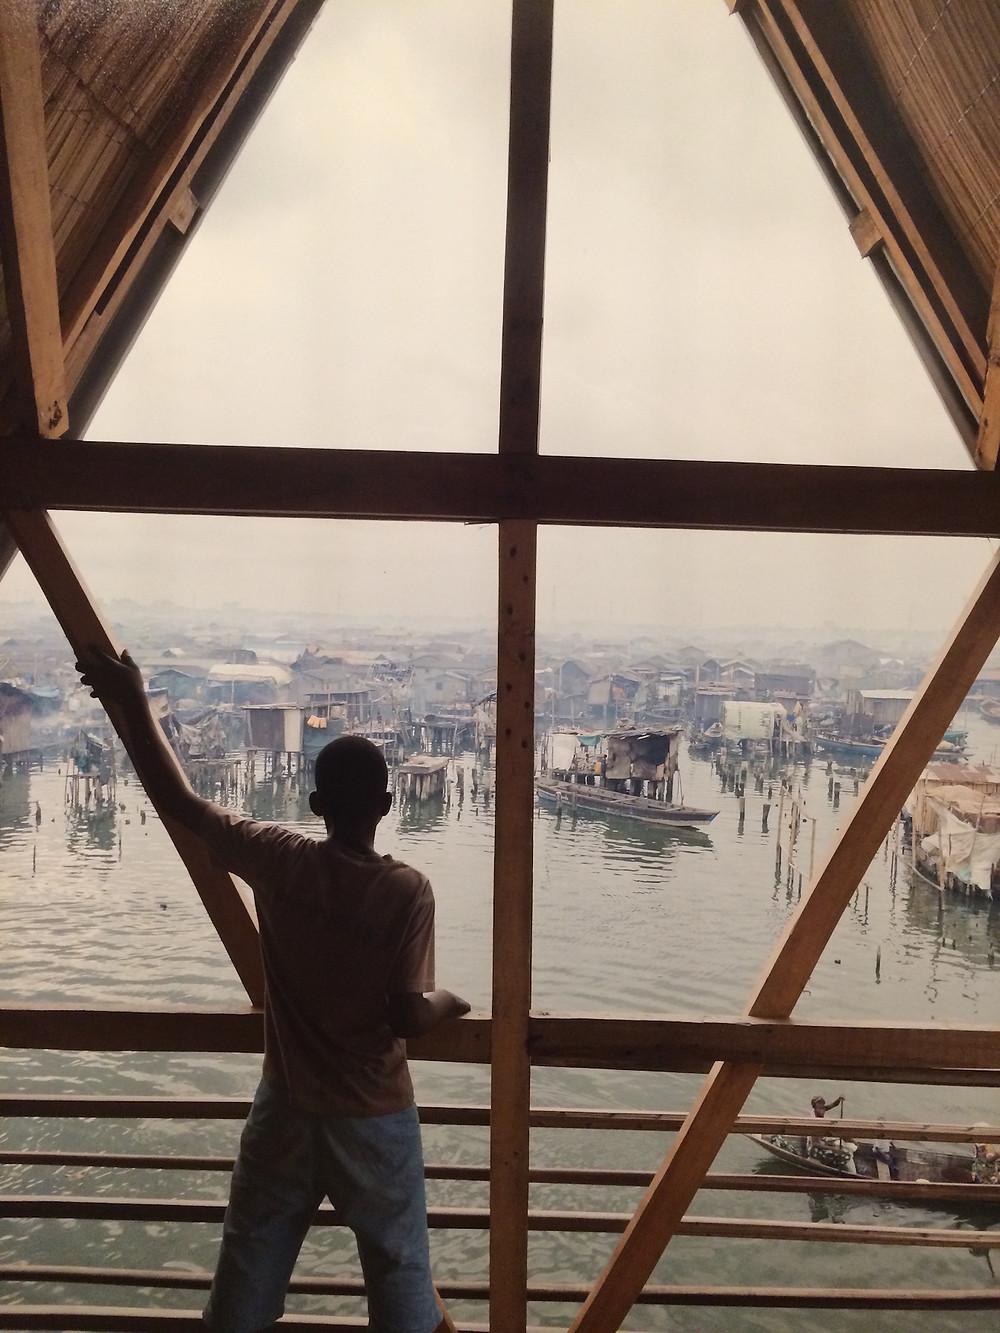 Makoko Floating School, Nigeria 2013, NLE architects